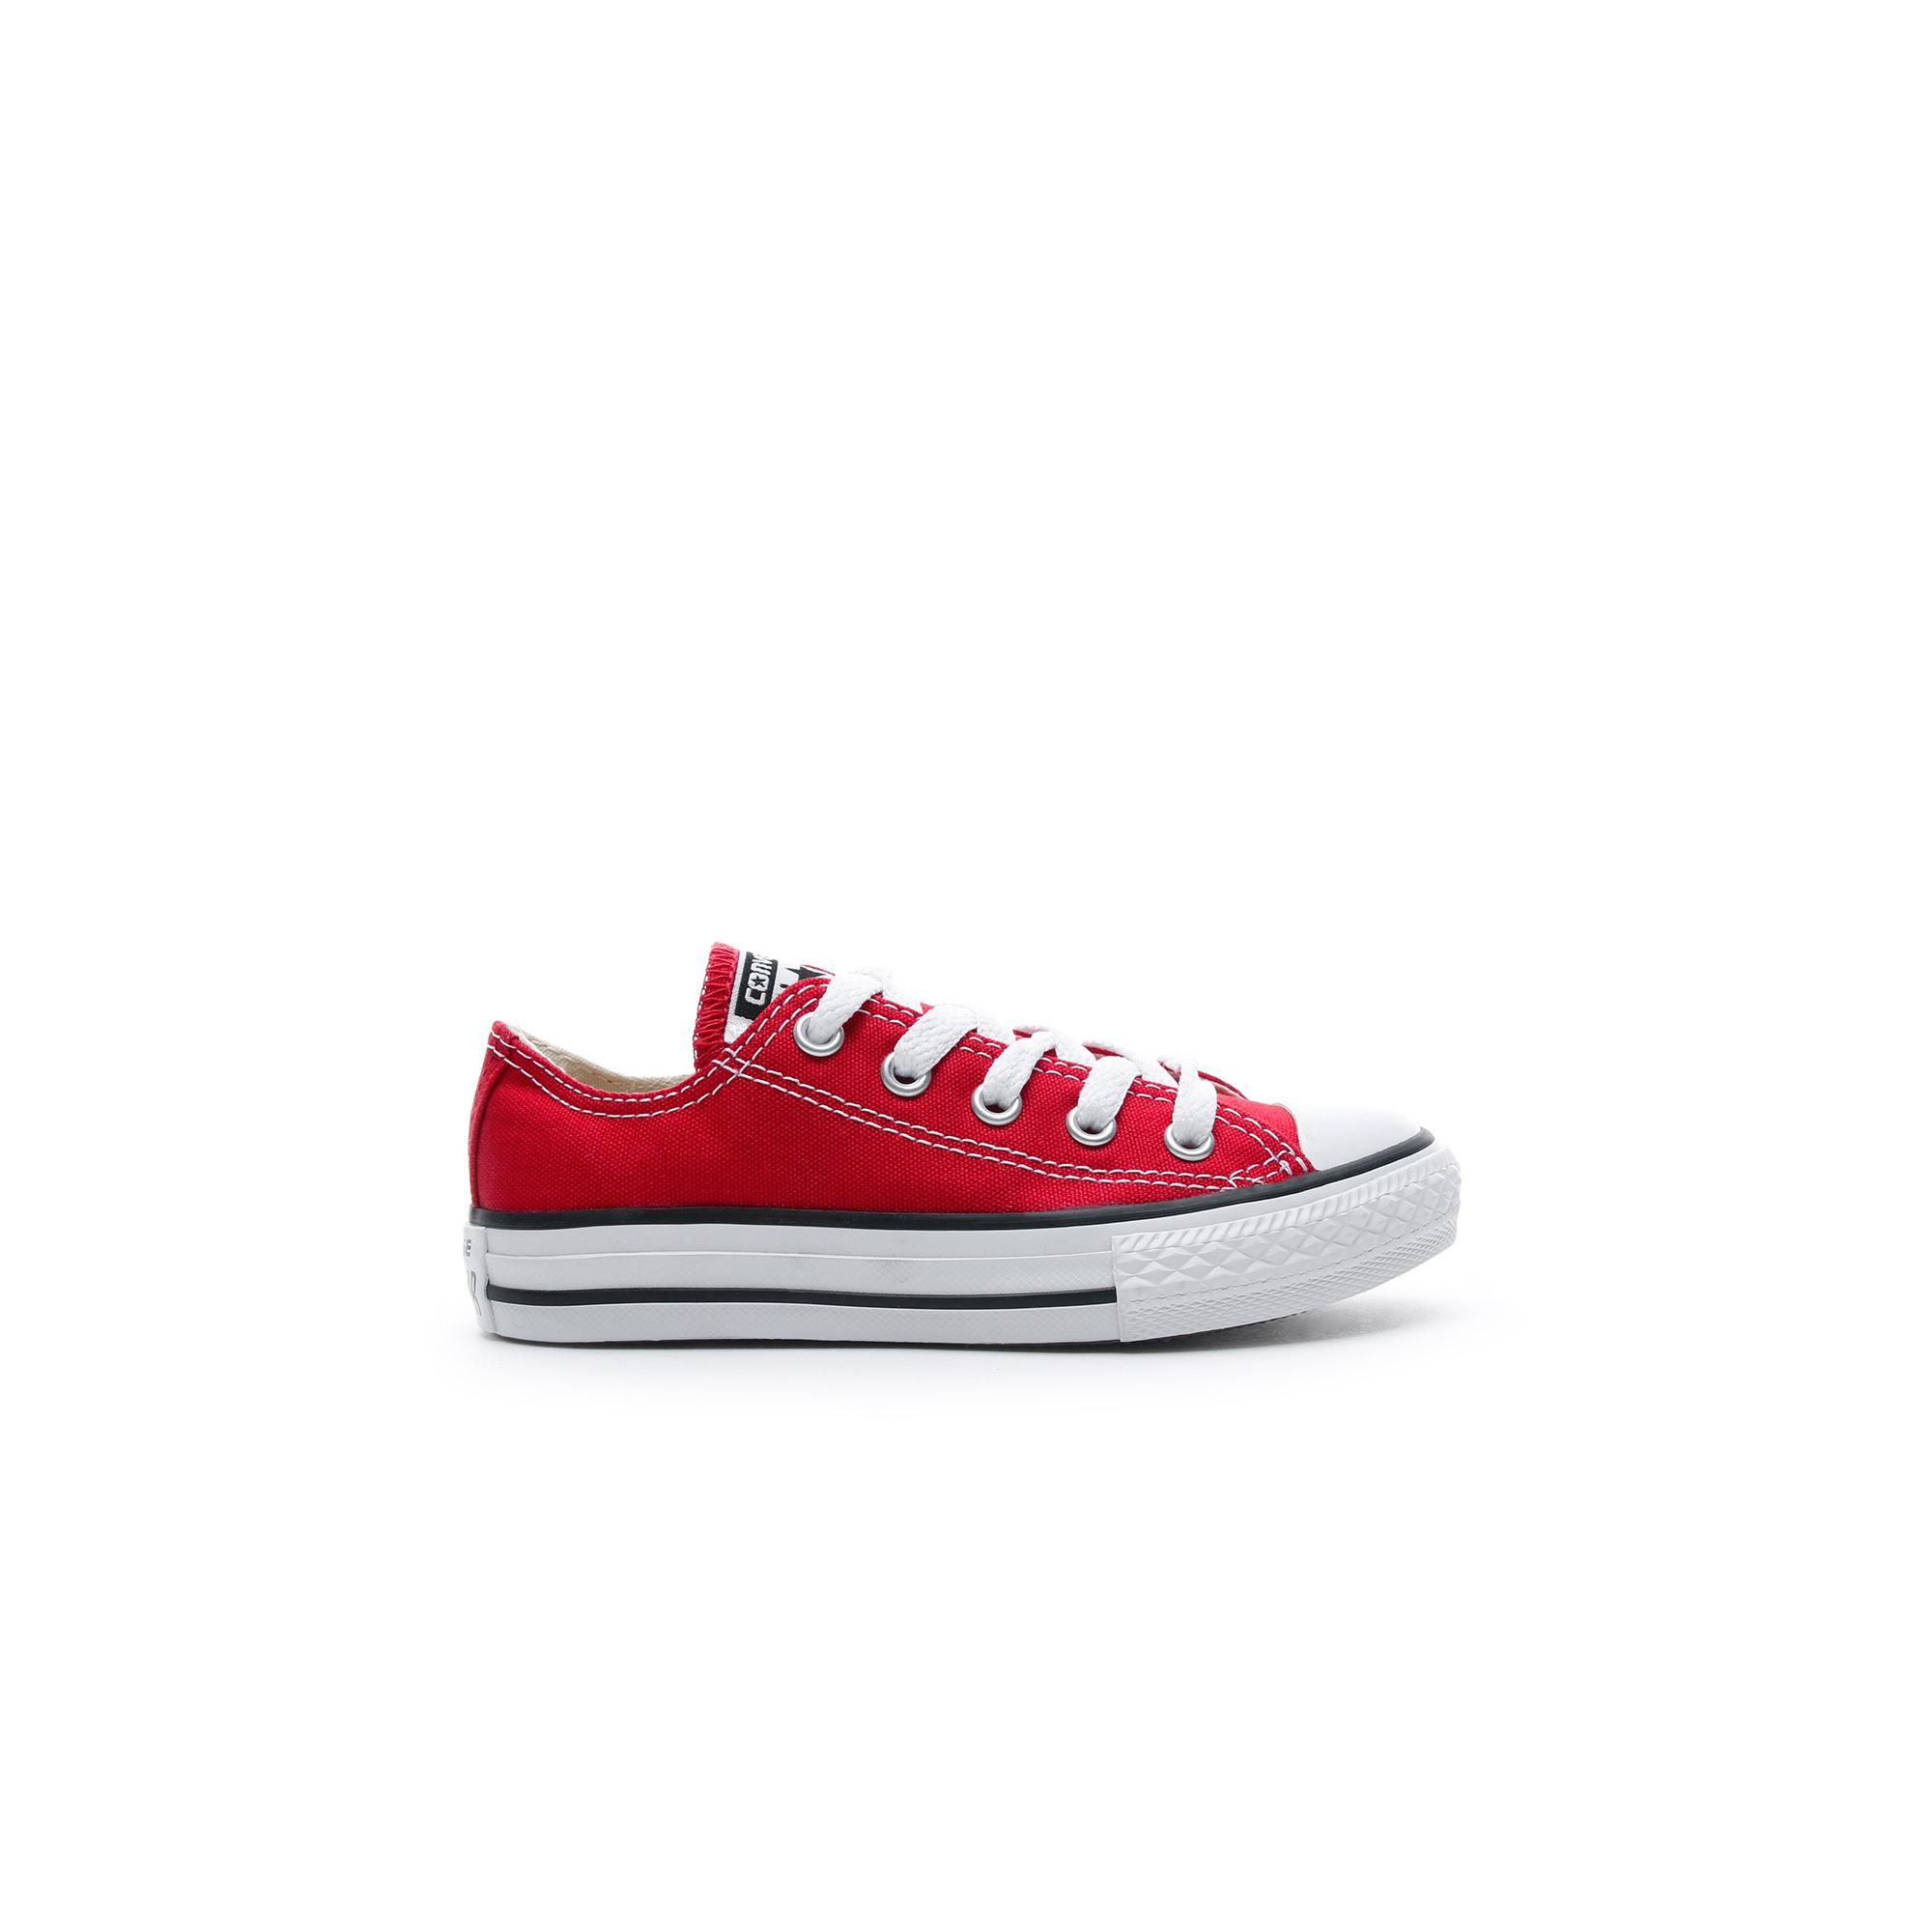 Converse Chuck Taylor All Star Çocuk Kırmızı Sneaker